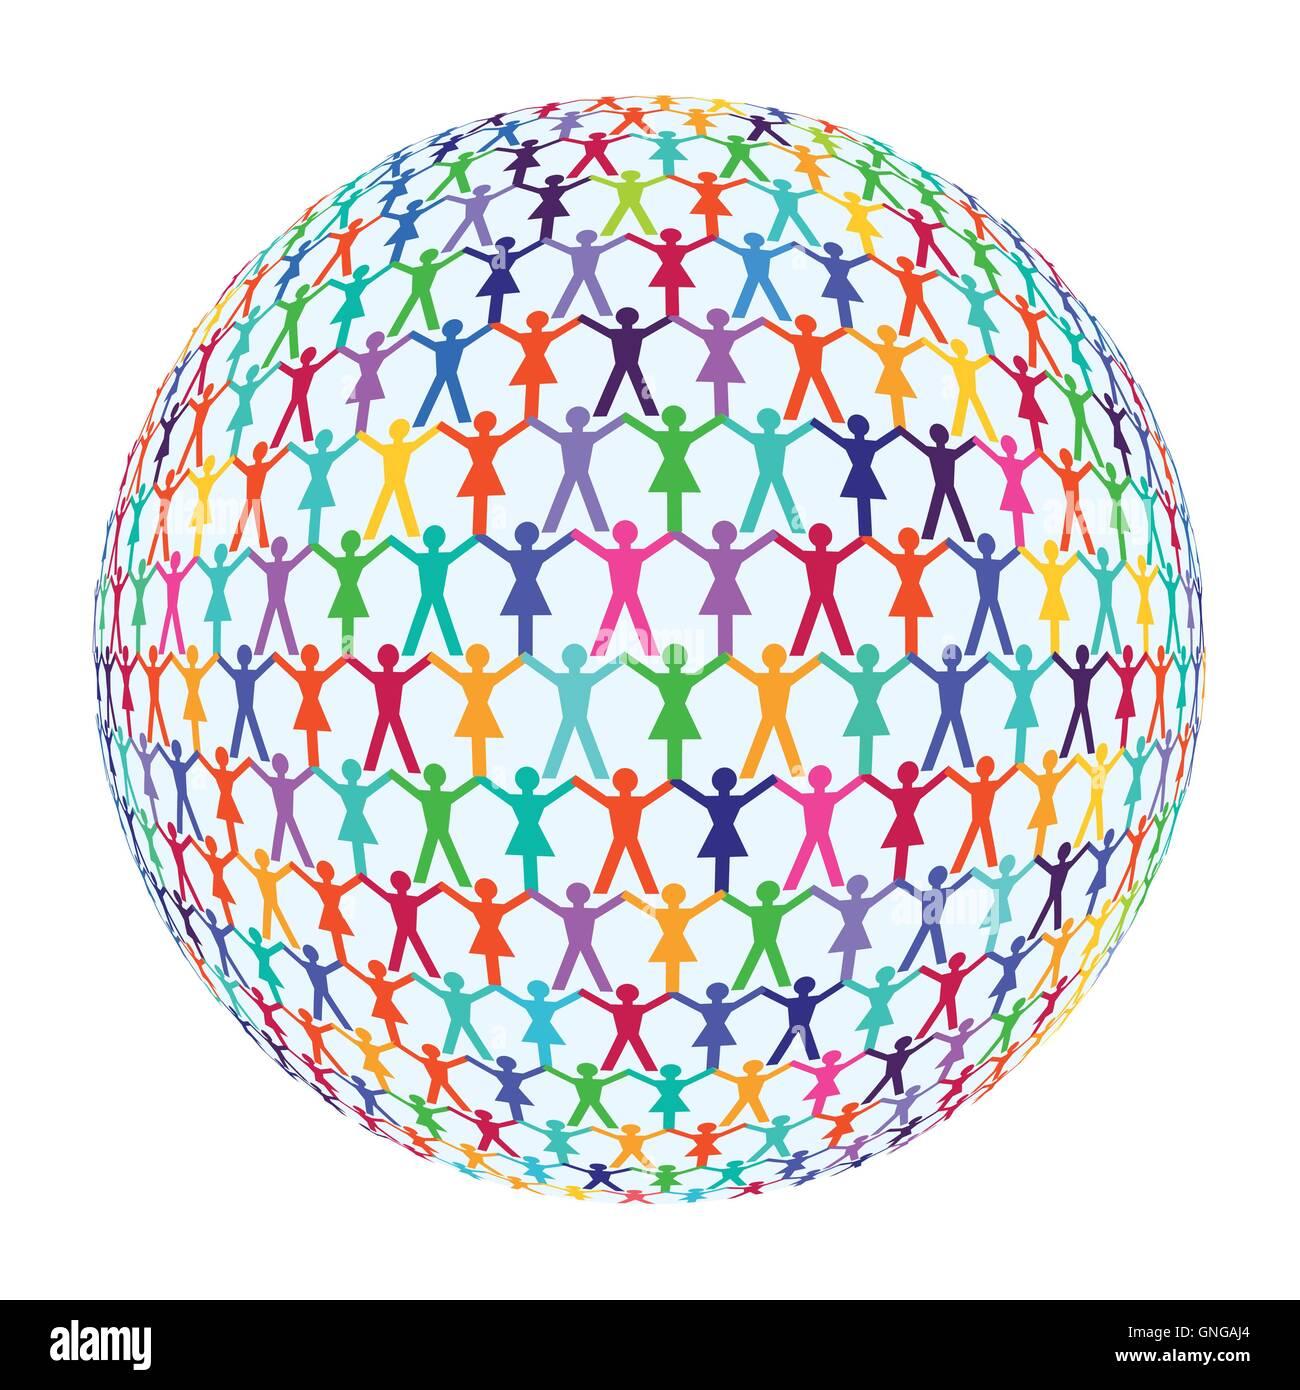 international population - Stock Image